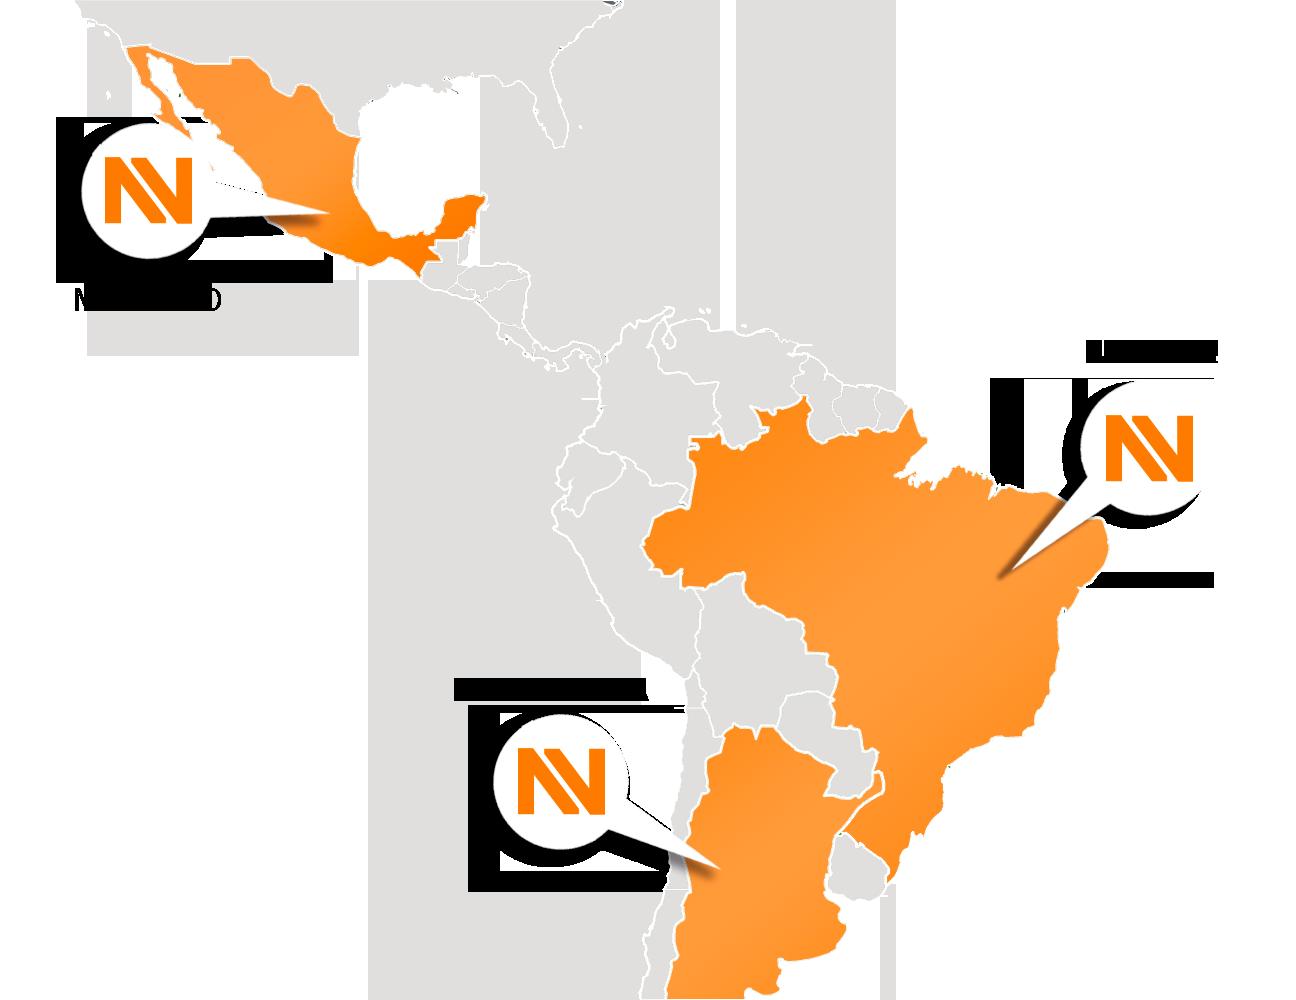 Mapa - Onde Estamos